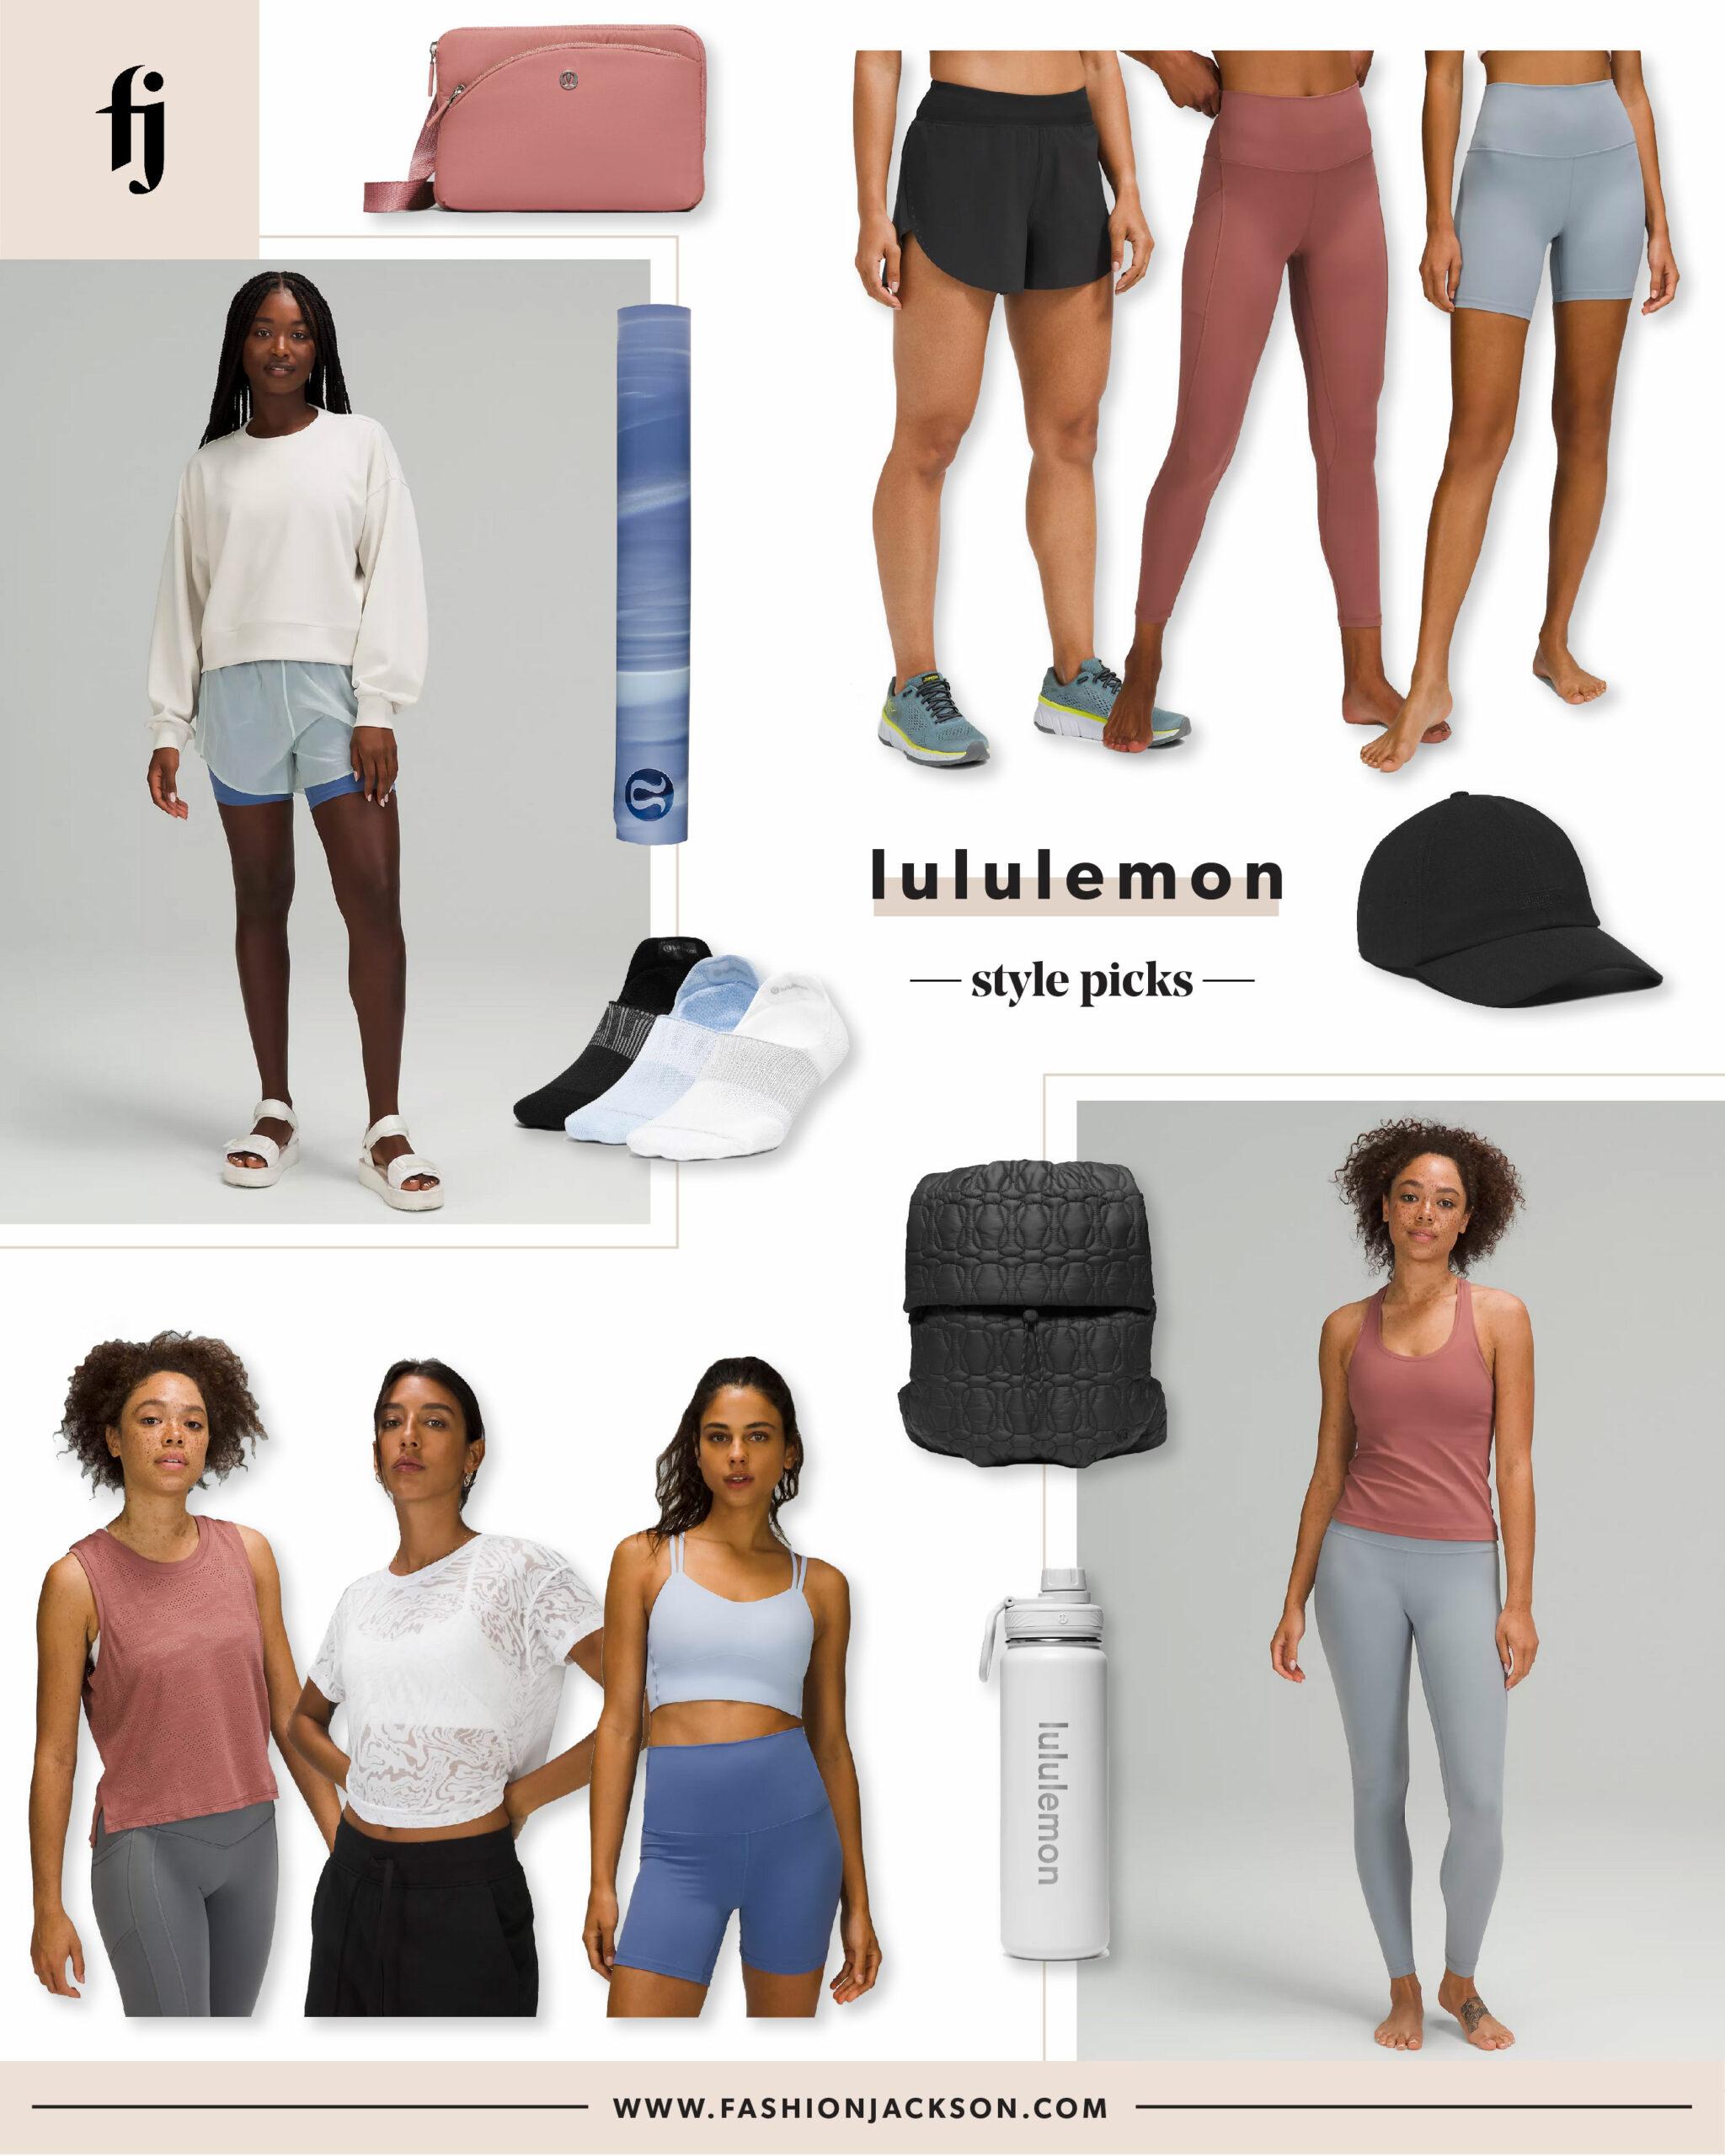 Fashion Jackson lululemon workout outfits for women